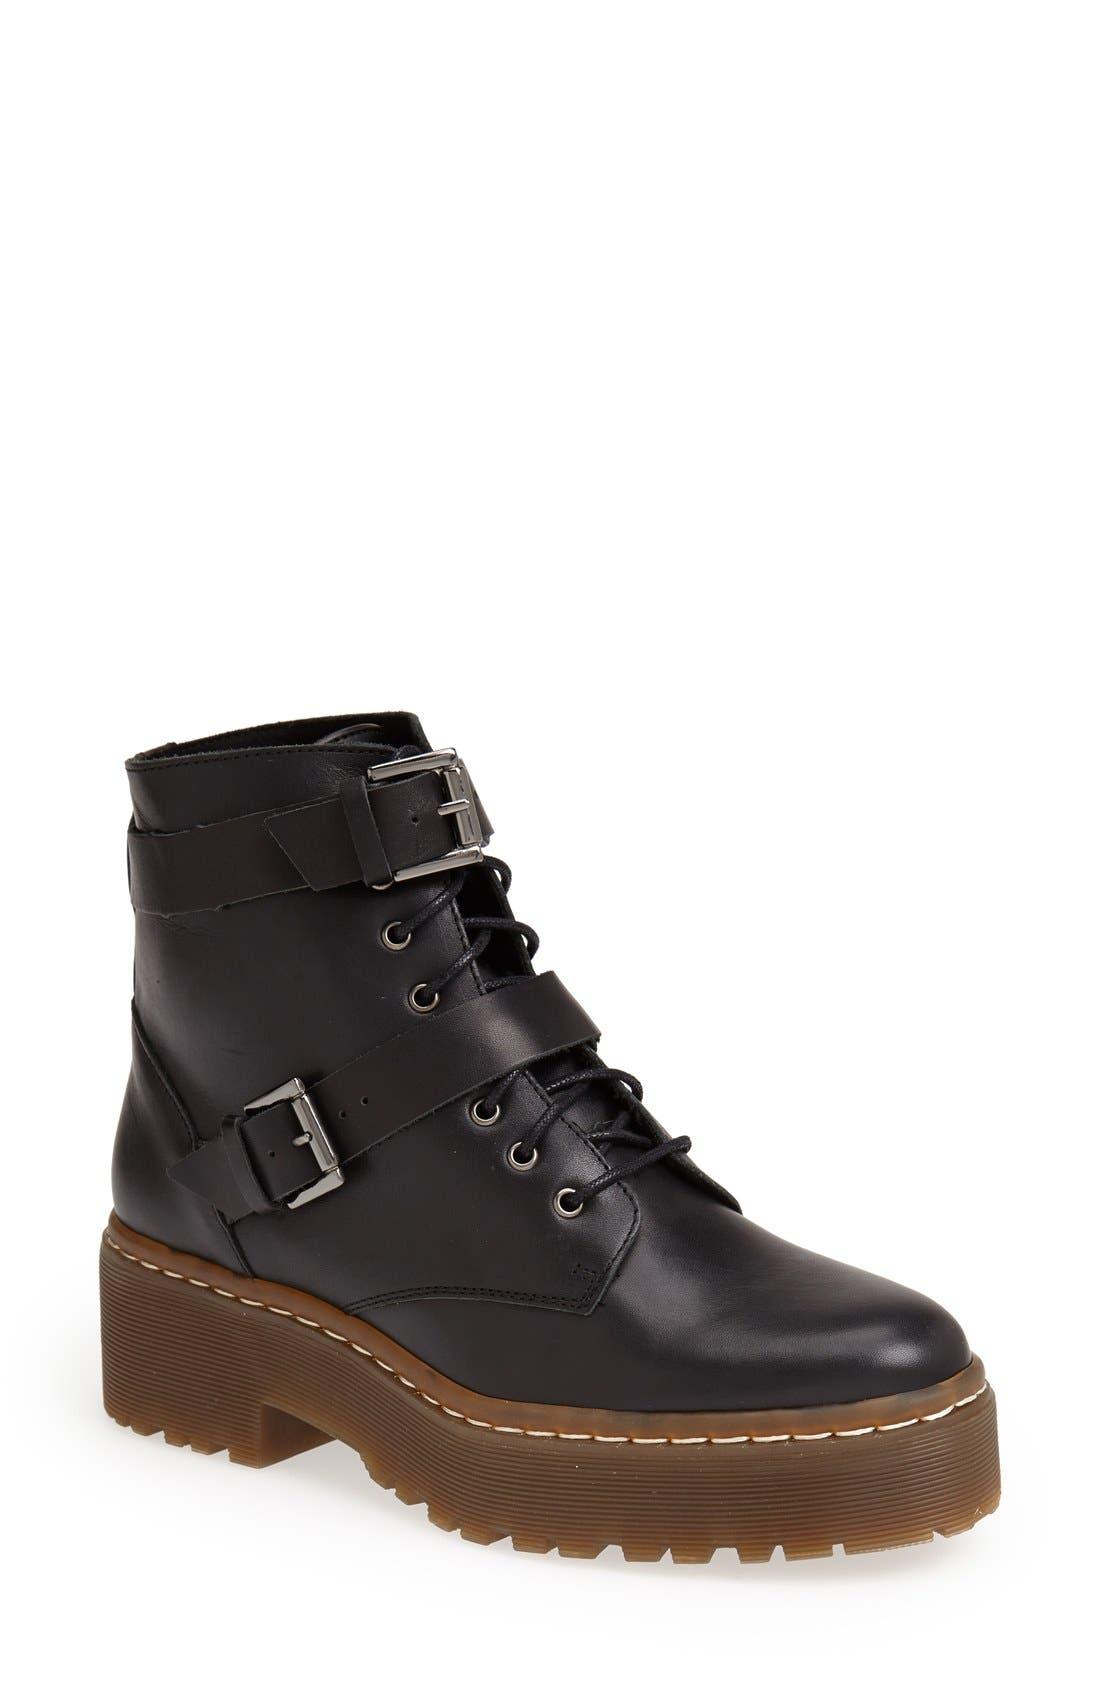 Alternate Image 1 Selected - Topshop 'Auction' Lace-Up Platform Boot (Women)